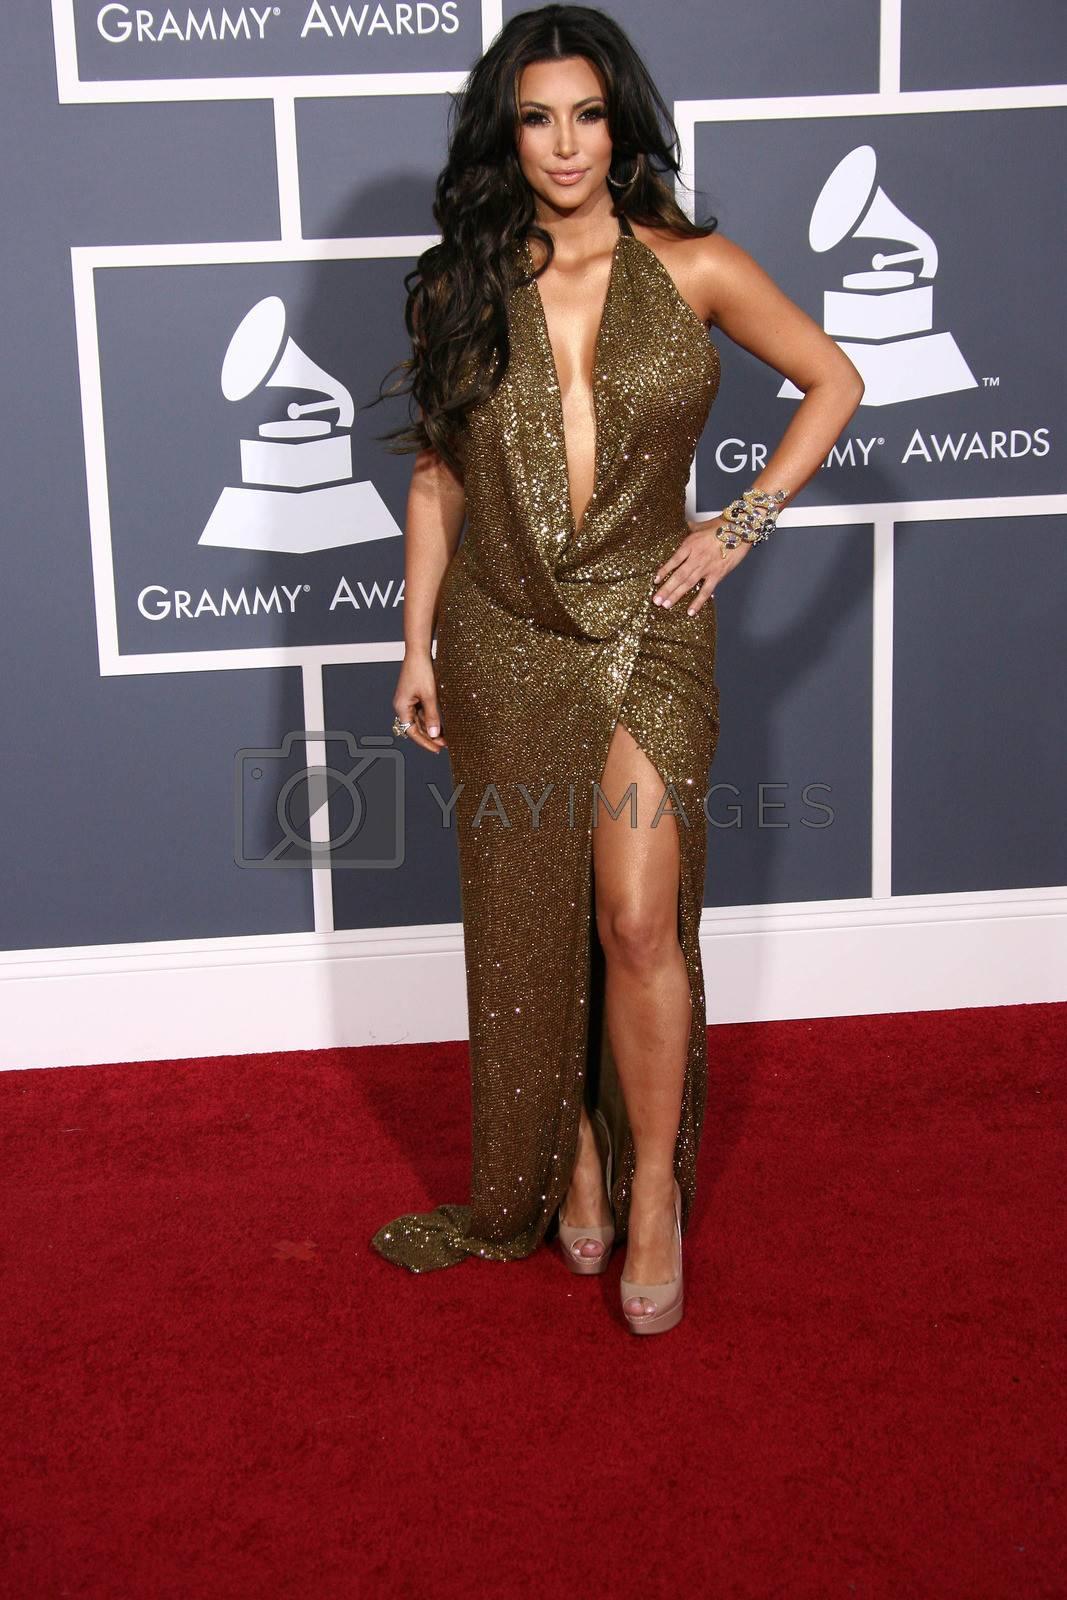 Kim Kardashian  at the 53rd Annual Grammy Awards, Staples Center, Los Angeles, CA. 02-13-11